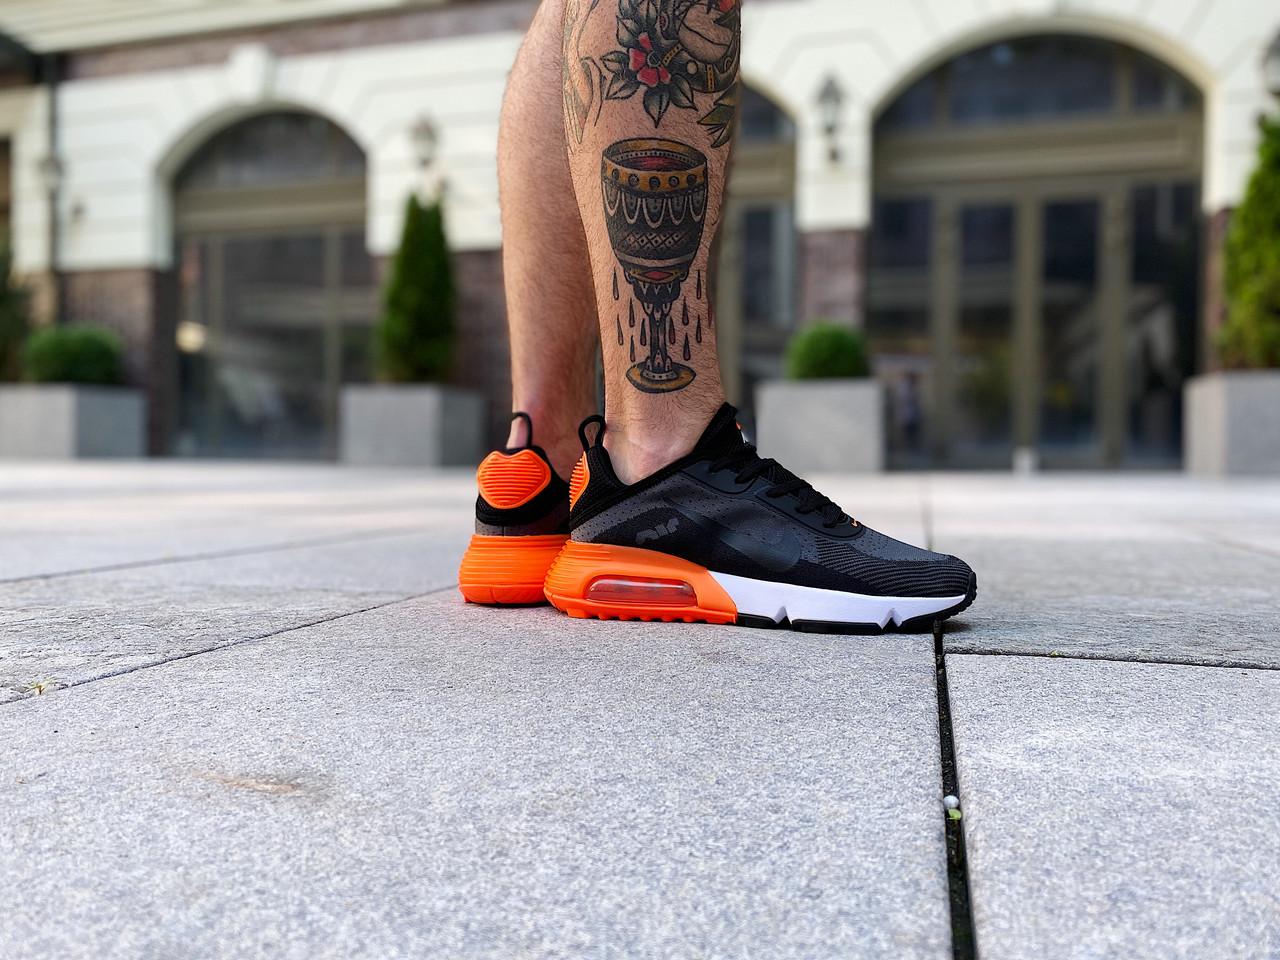 Кроссовки мужские Nike Air Max 2090 / CT7698-005 (Размеры:42,43)